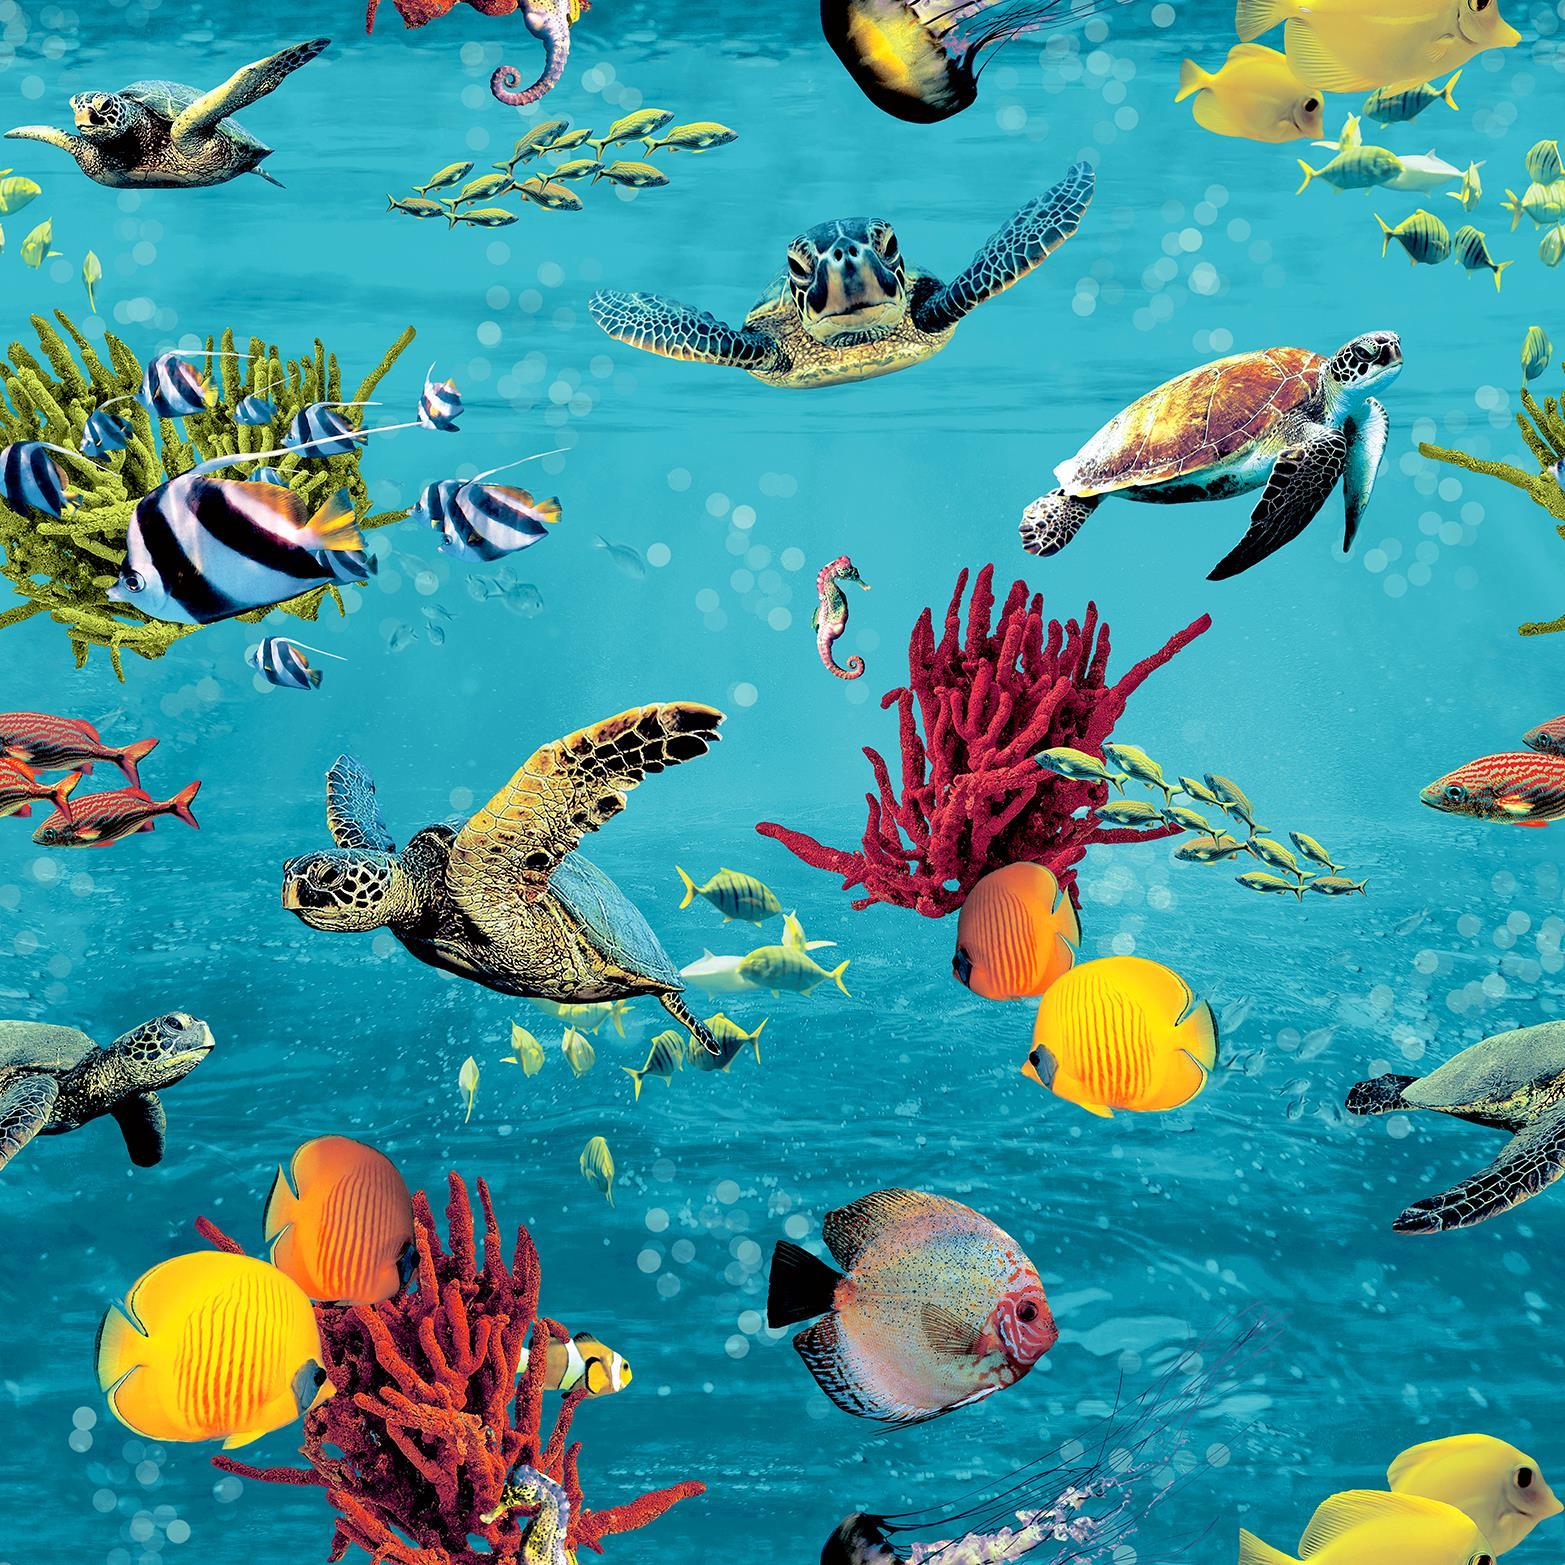 Ocean Sea Life Wallpaper Jelly Fish Turtle Sea Horse Blue Yellow Red Green Rasch 4000441310405 Ebay